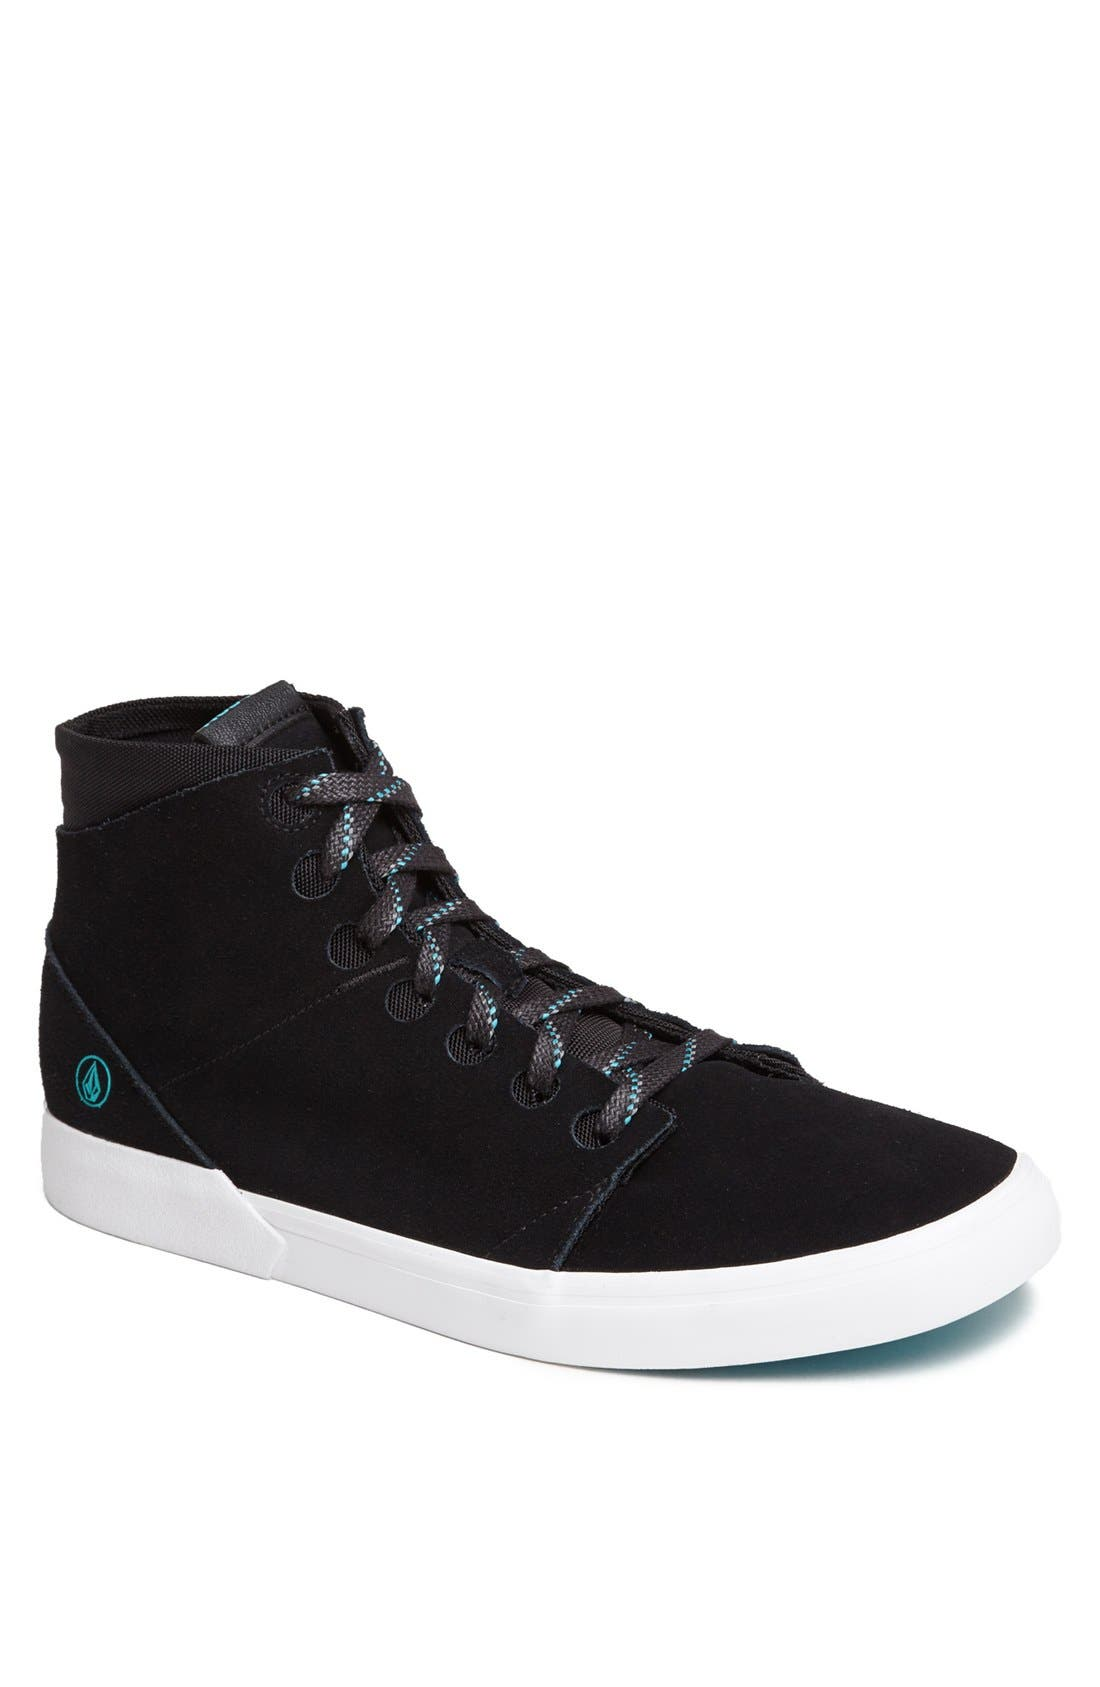 Alternate Image 1 Selected - Volcom 'Buzzard' Sneaker